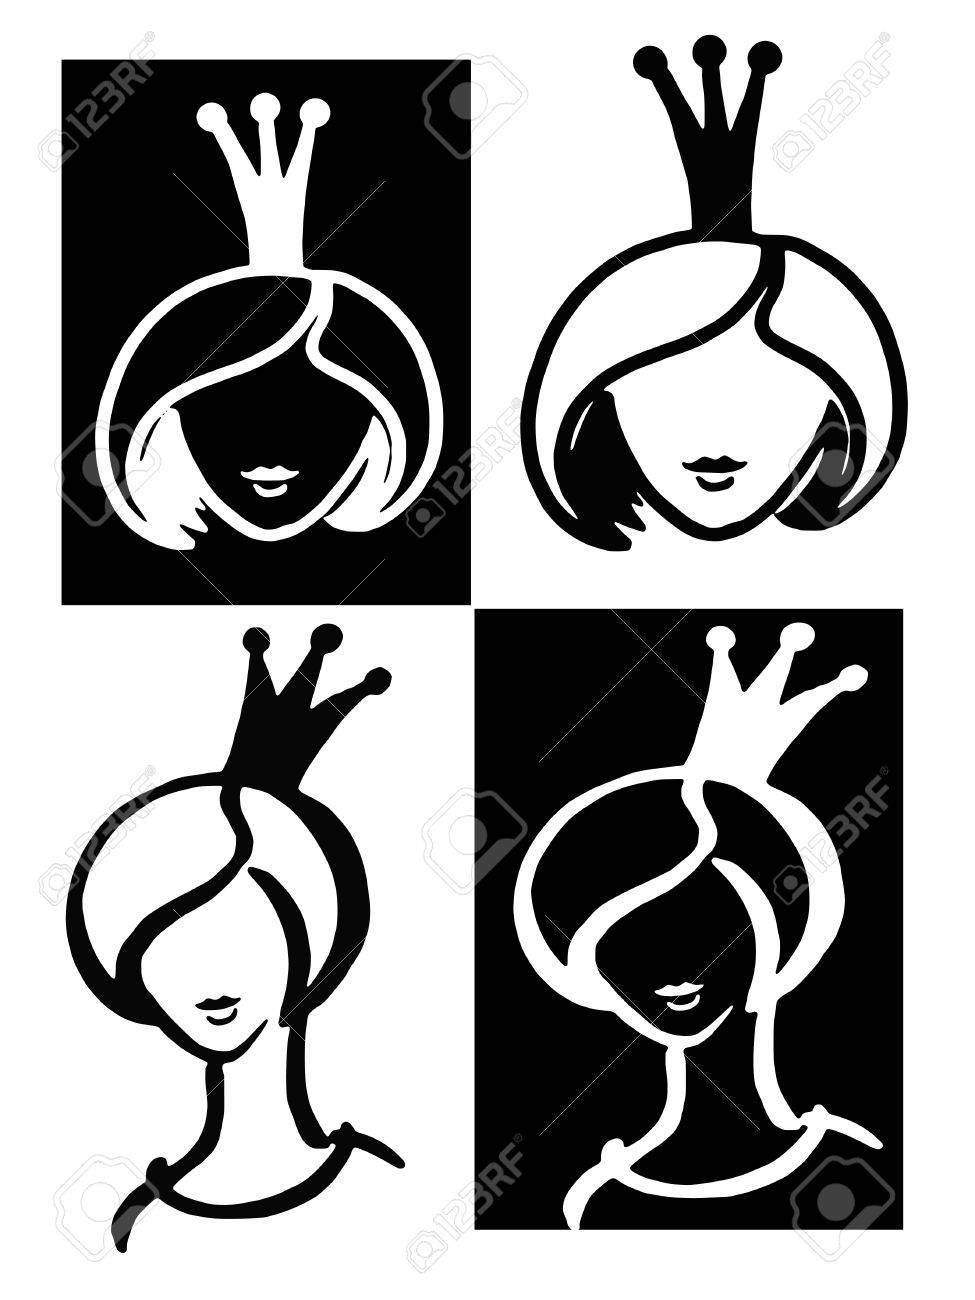 Hand Drawn Cartoon Sketch Illustration Of Princess Beauty Royalty Free Cliparts Vectors And Stock Illustration Image 27357581